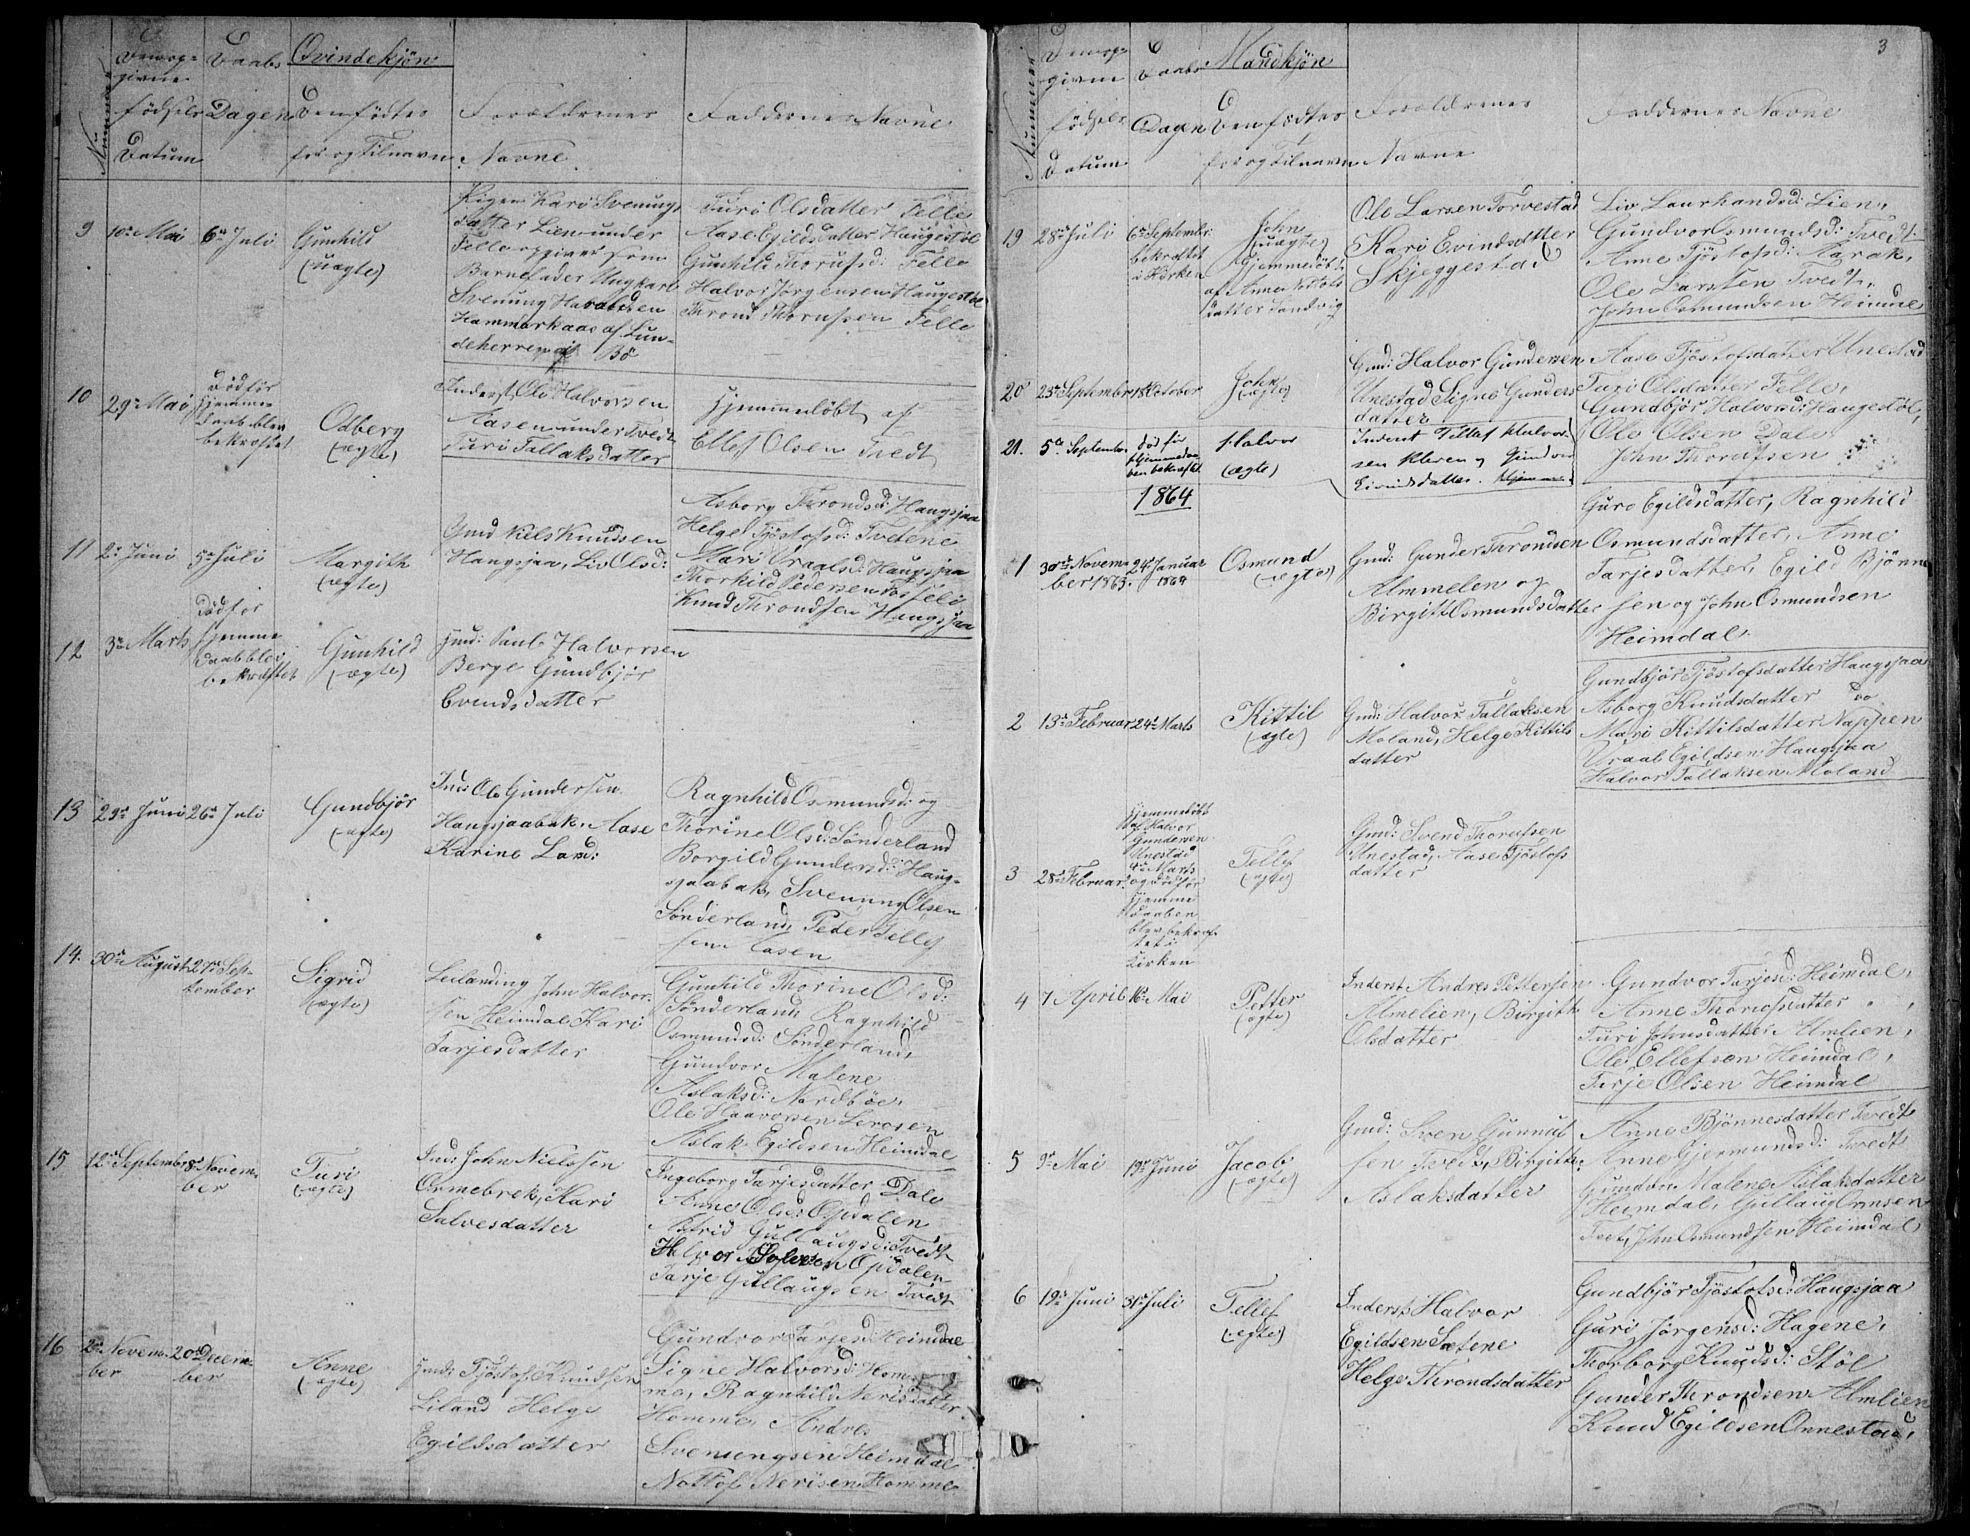 SAKO, Nissedal kirkebøker, G/Gb/L0002: Klokkerbok nr. II 2, 1863-1892, s. 3